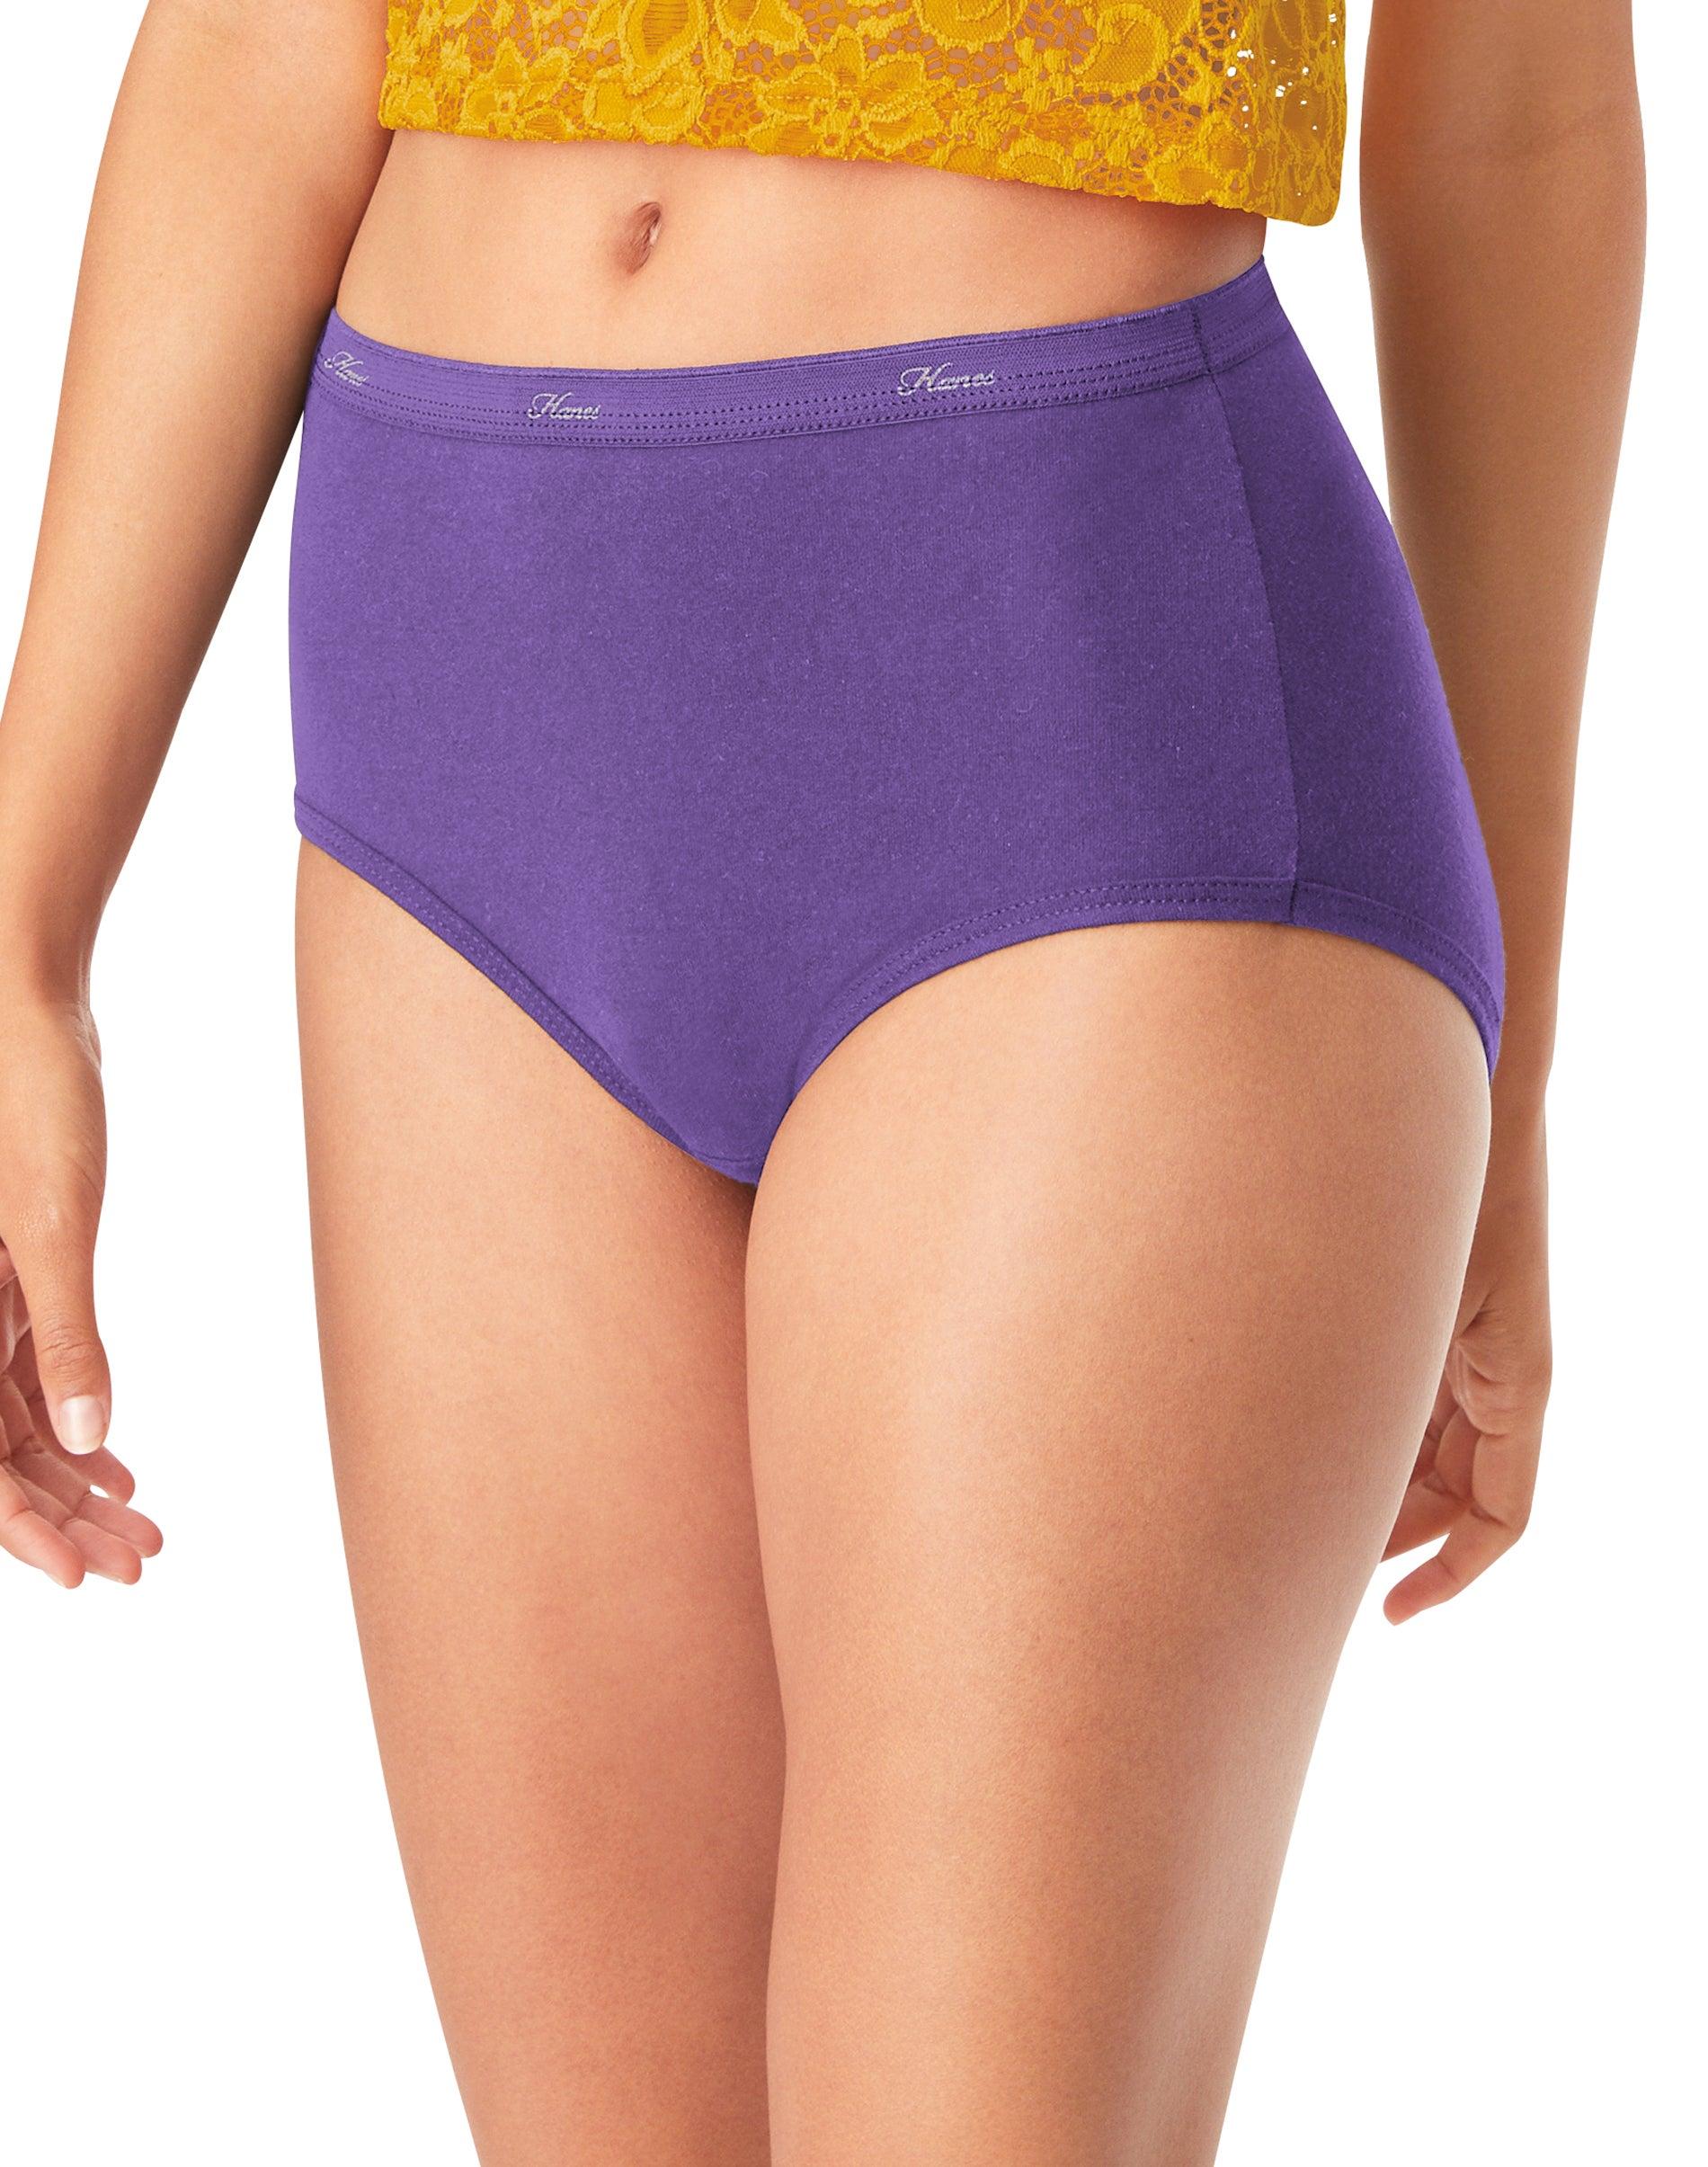 6pcs Womens Comfort Elastic Hipster Panty Underwear Brief NK1